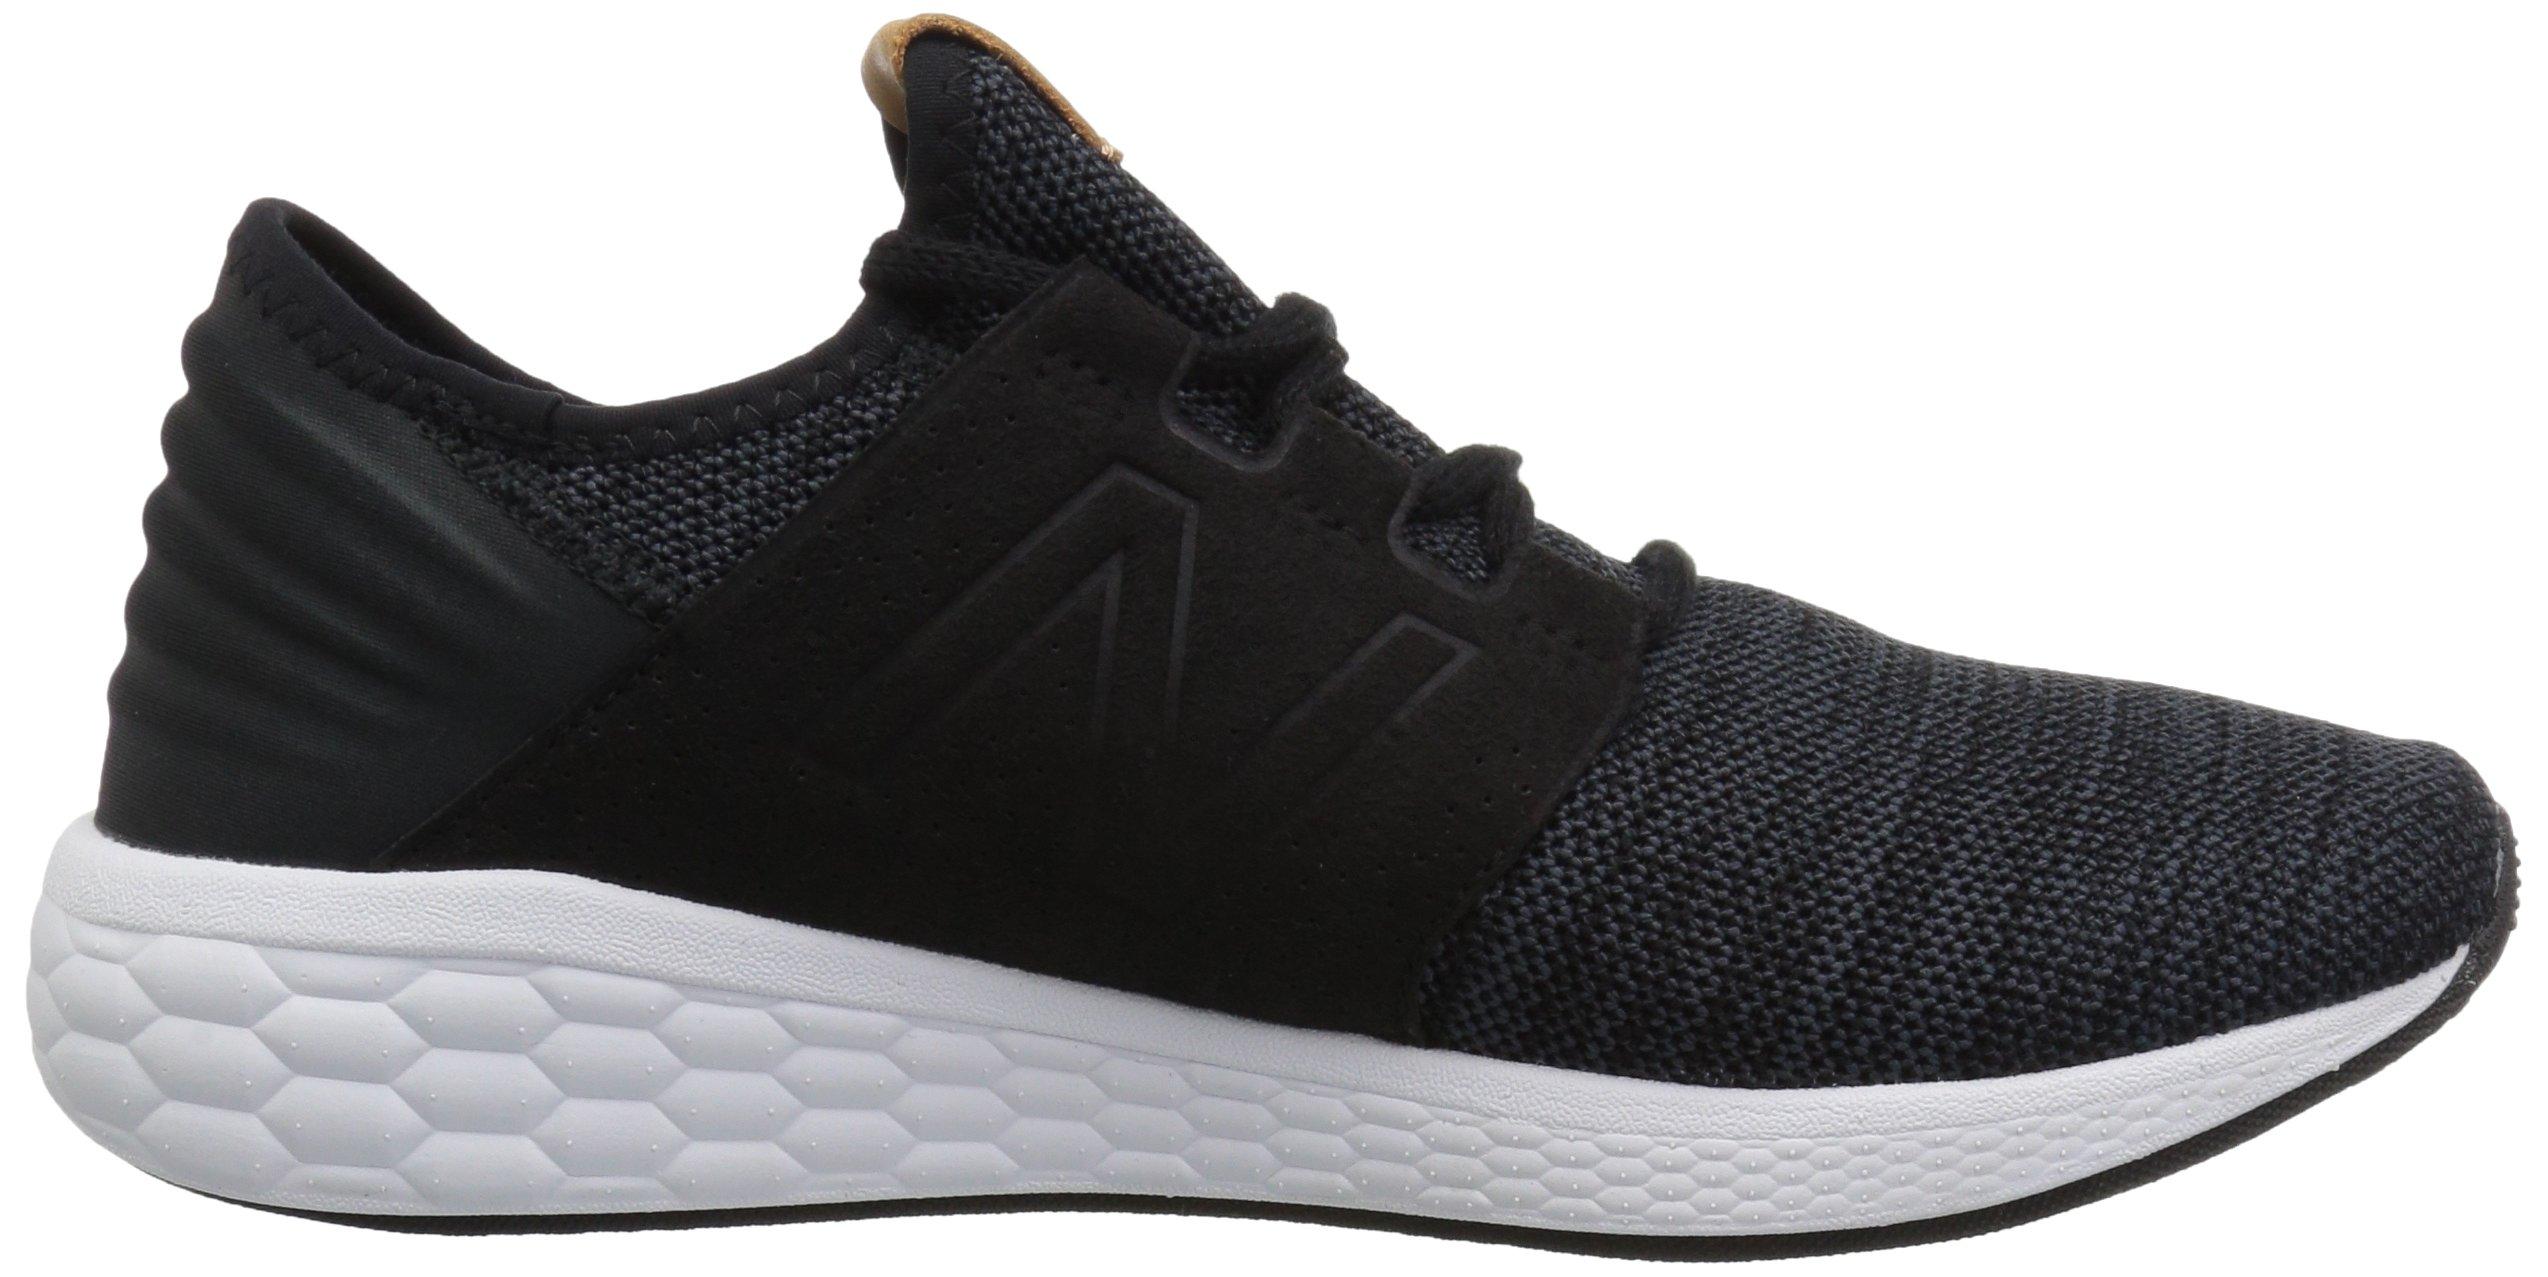 New Balance Men's Cruz V2 Fresh Foam Running Shoe, black/white, 7 D US by New Balance (Image #6)